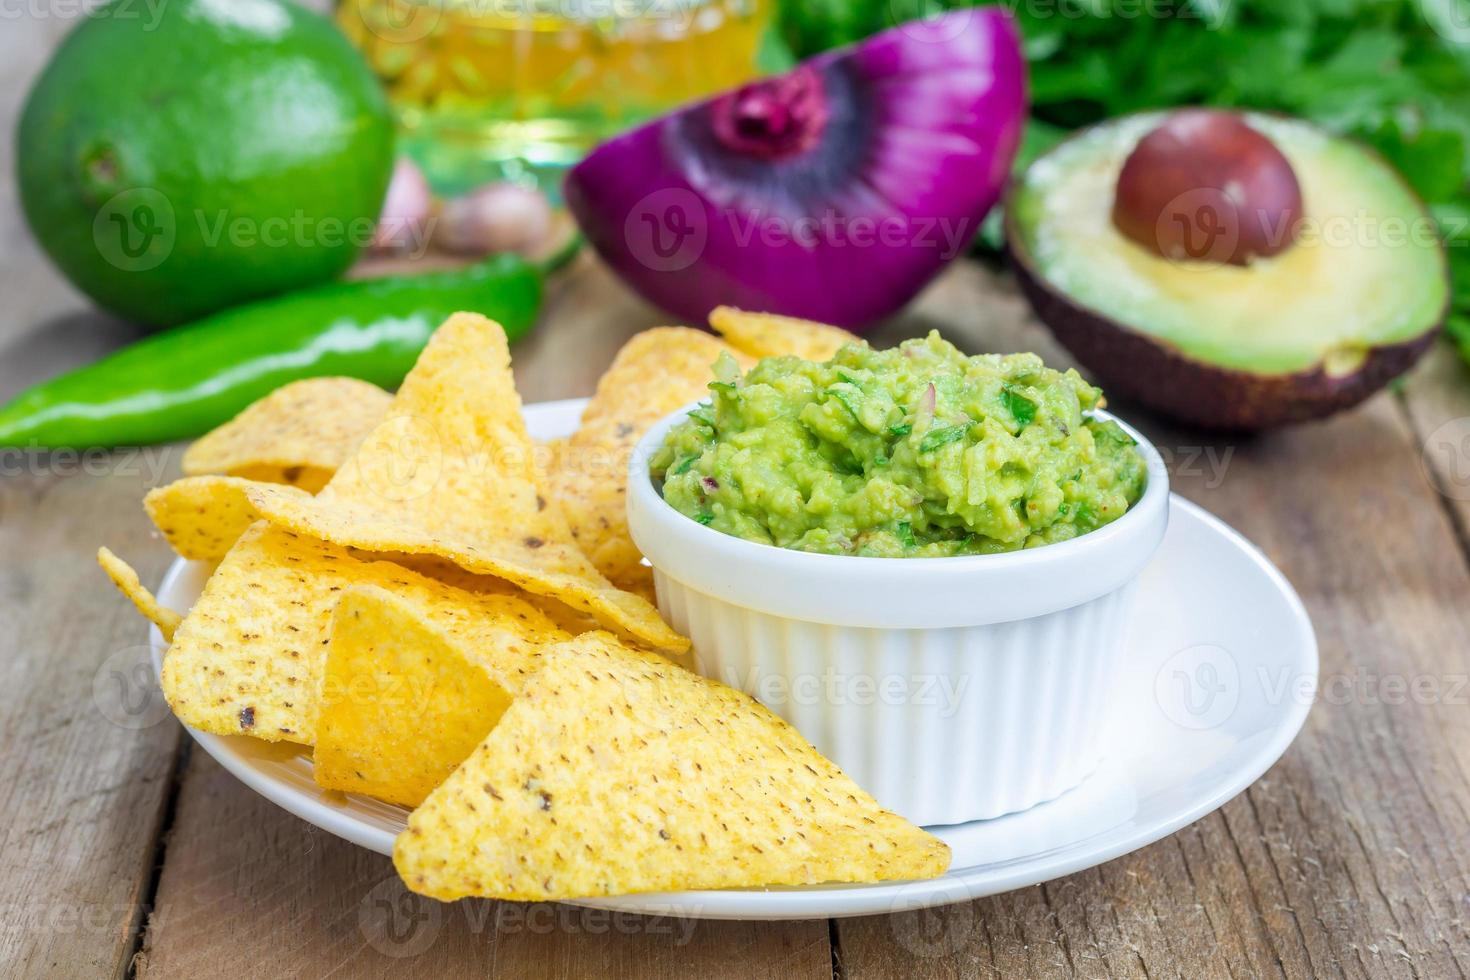 copo com guacamole robusto servido com nachos foto